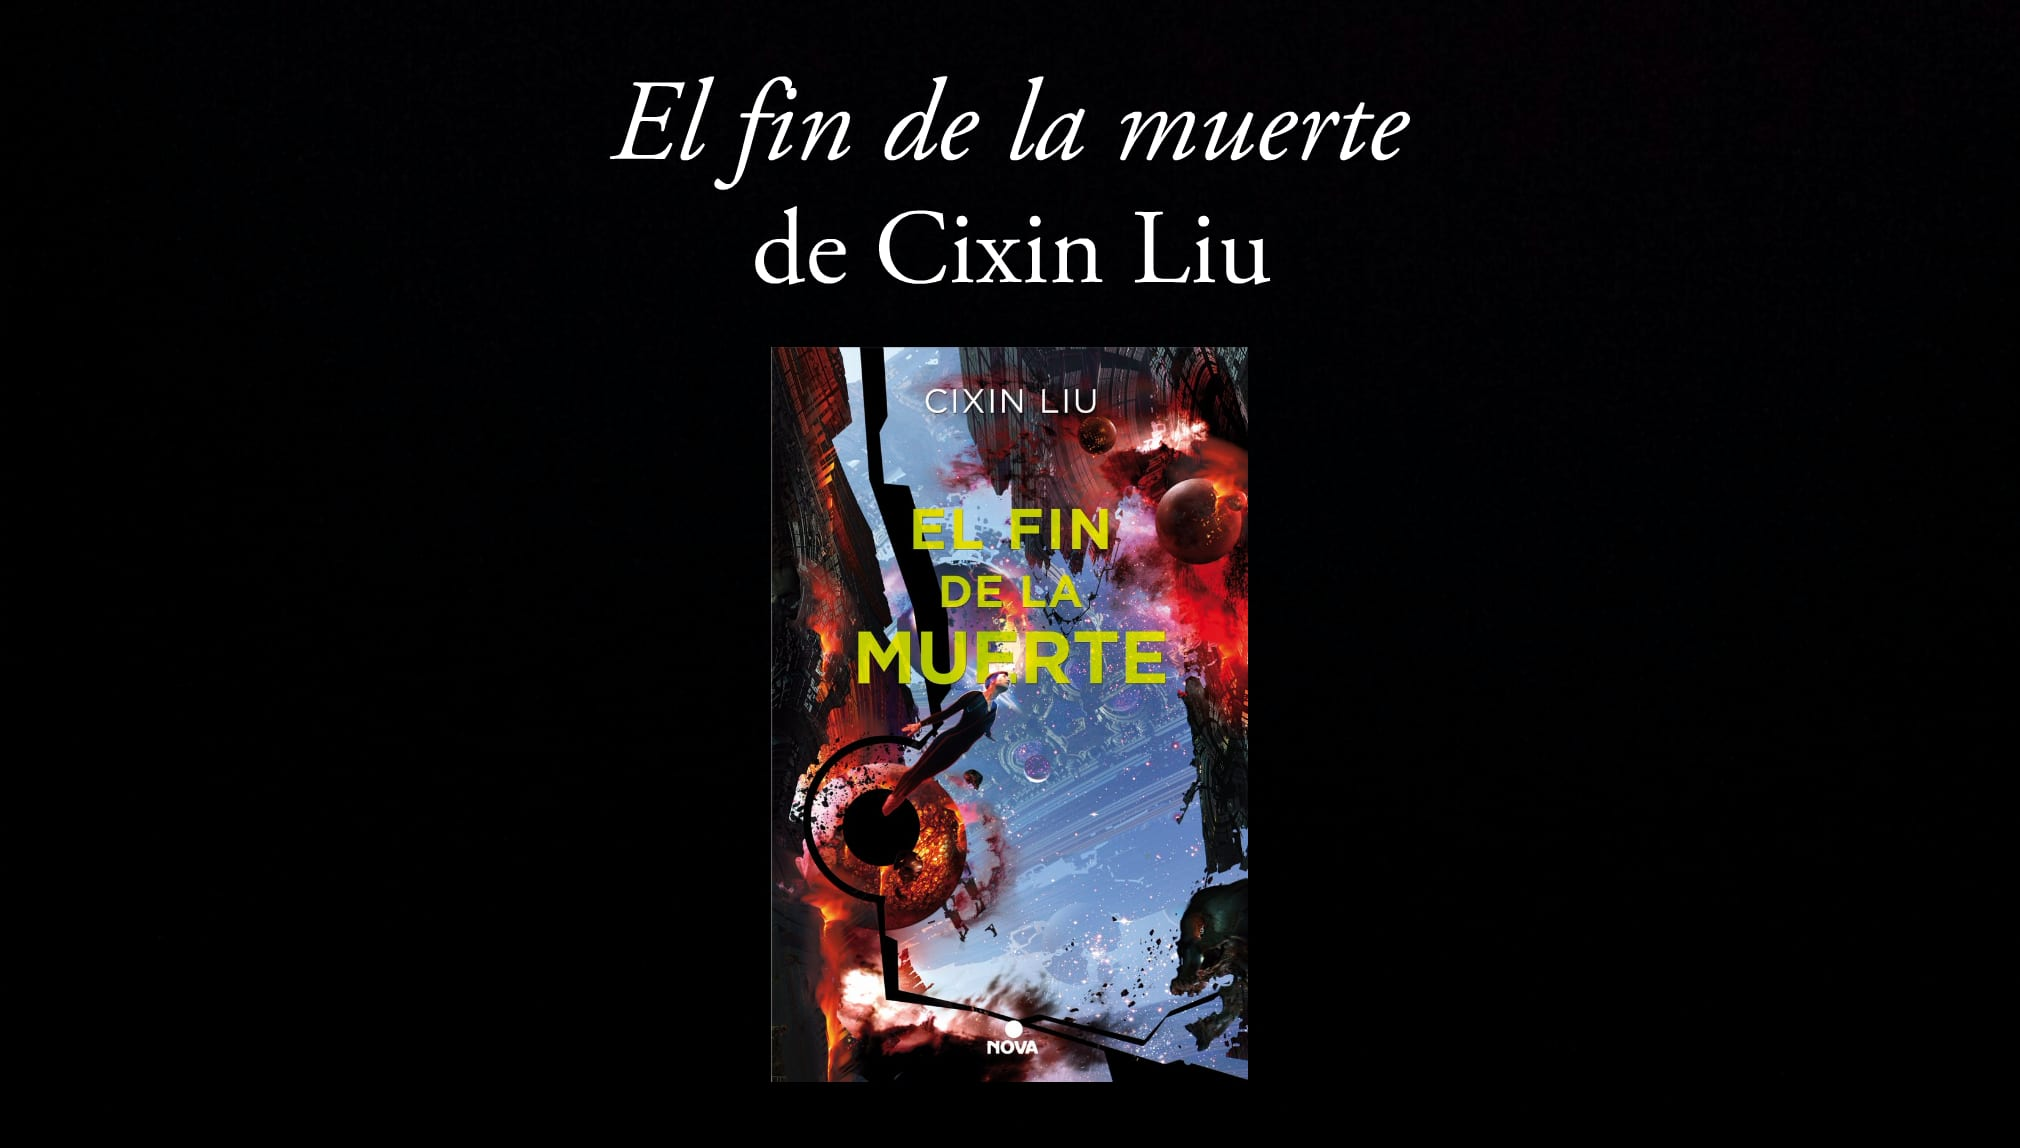 El fin de la muerte de Cixin Liu.